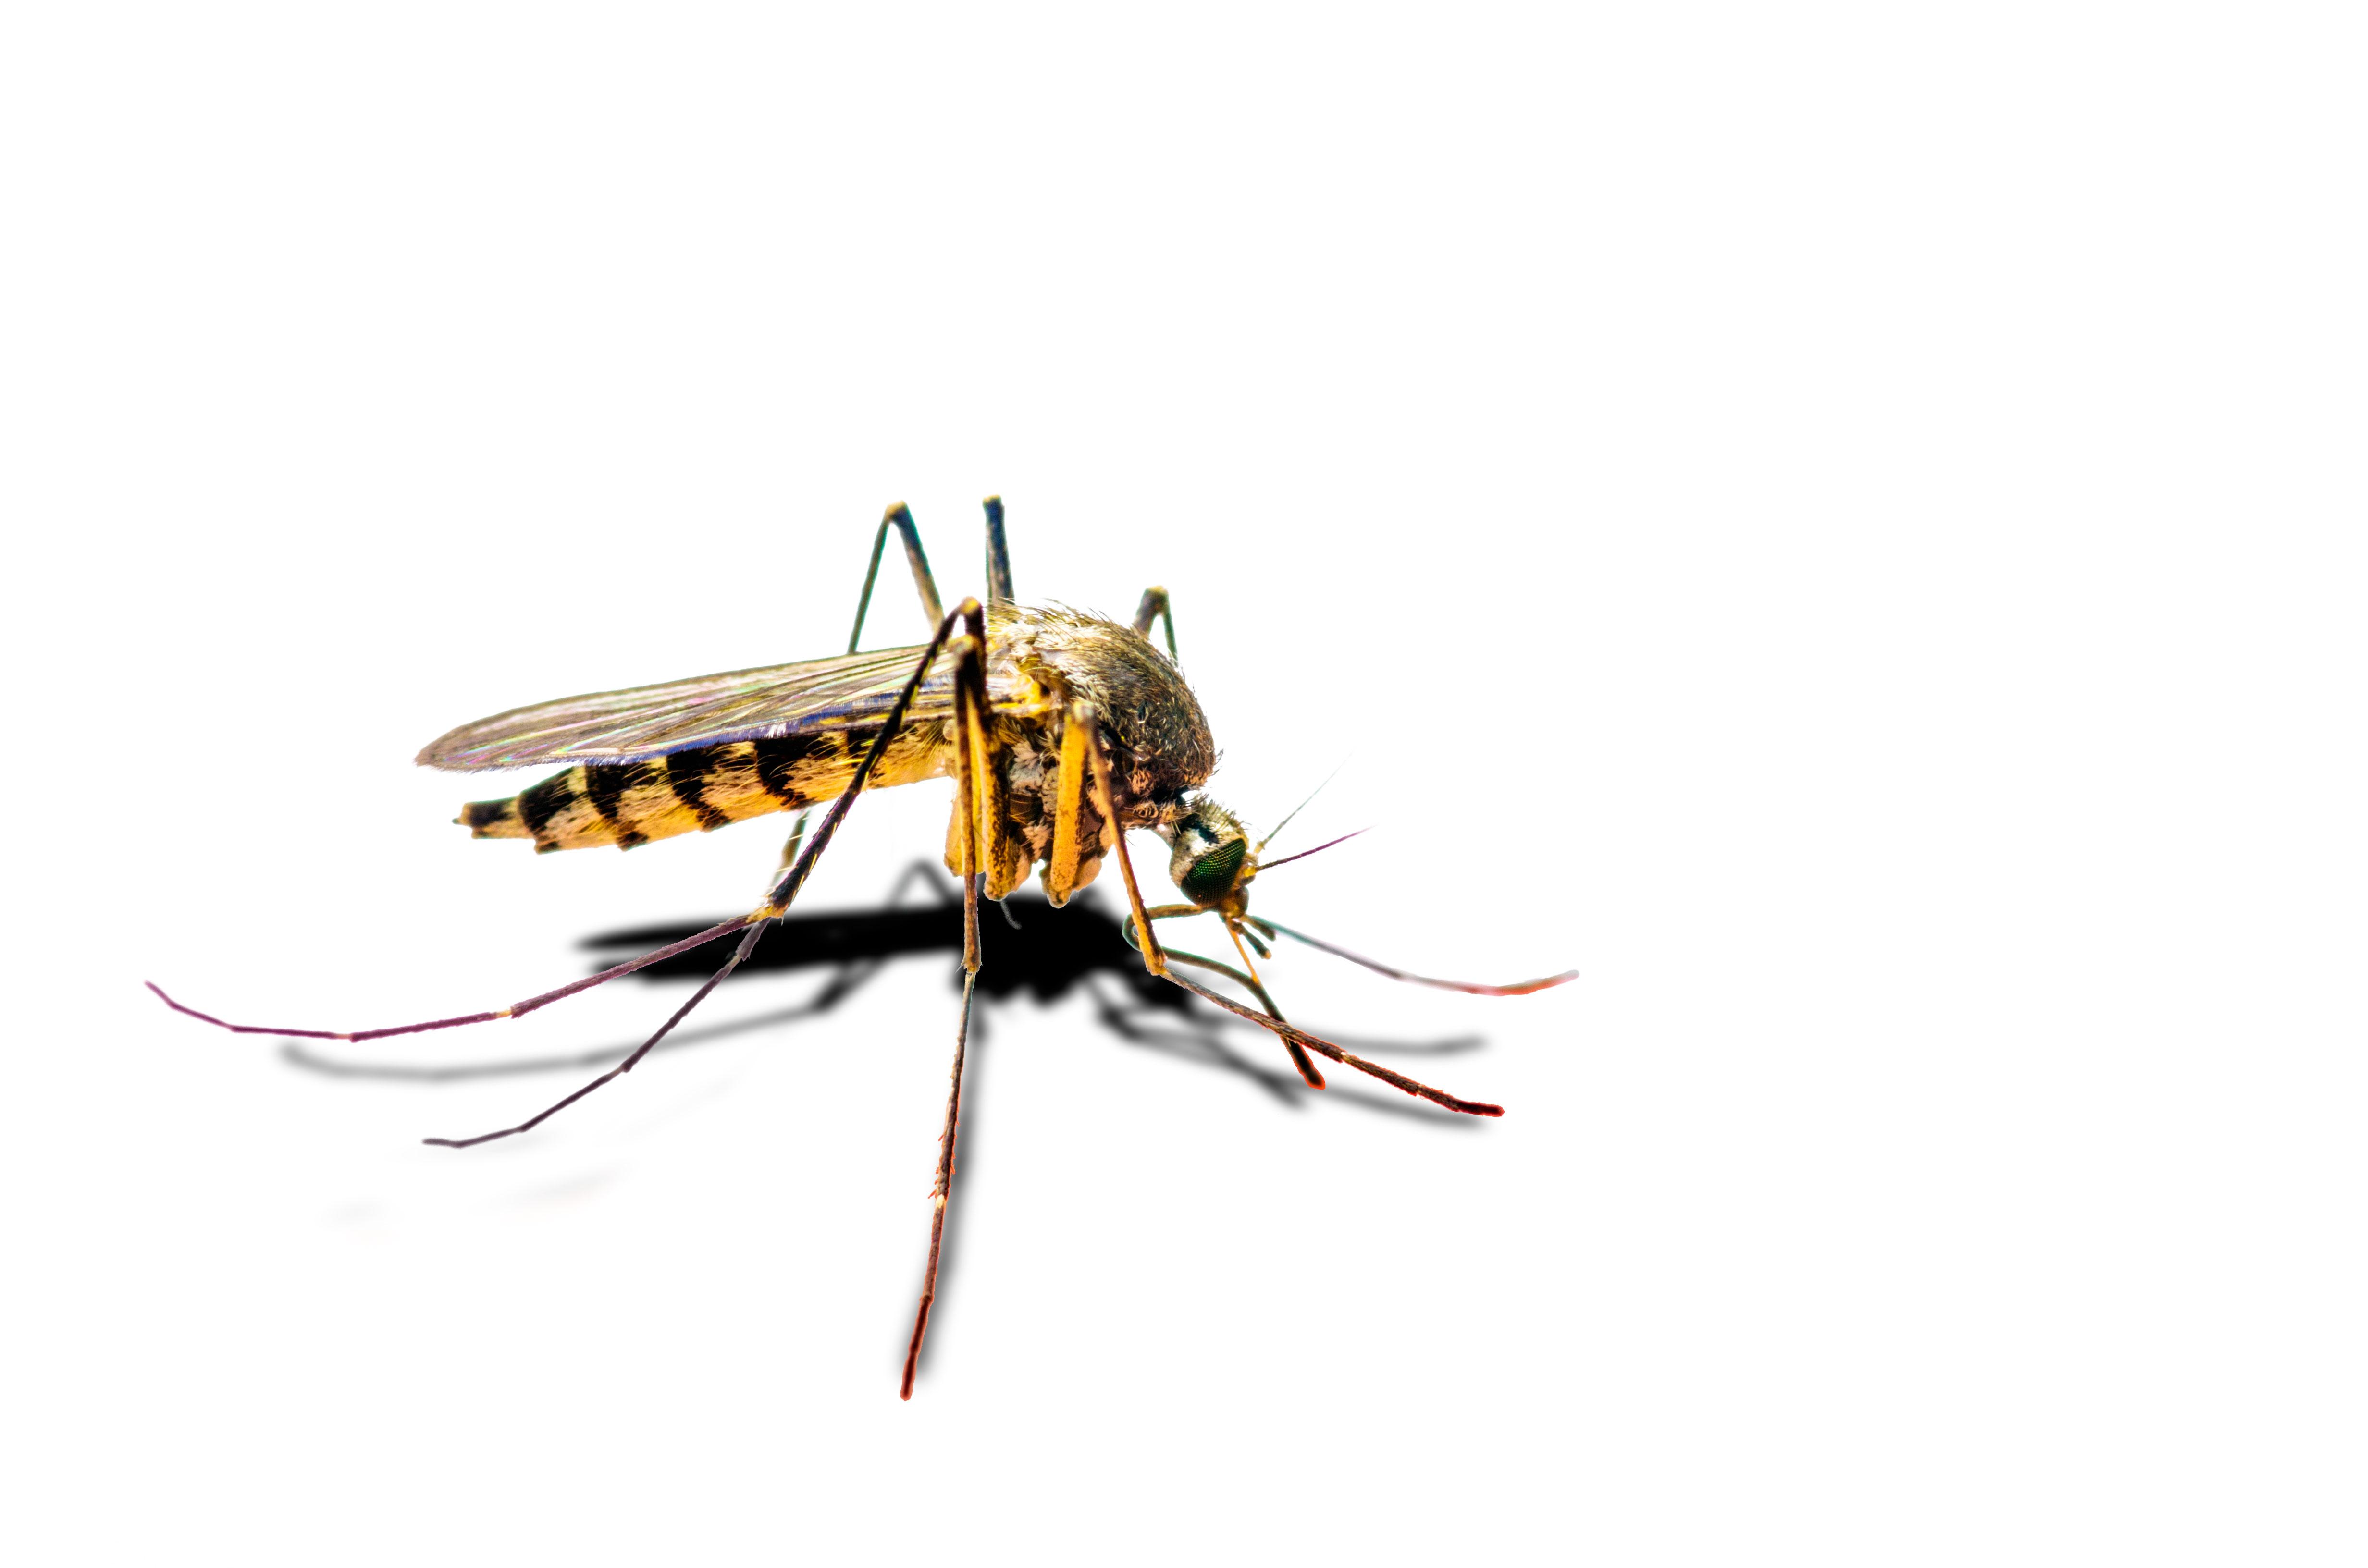 Stinging Mosquito